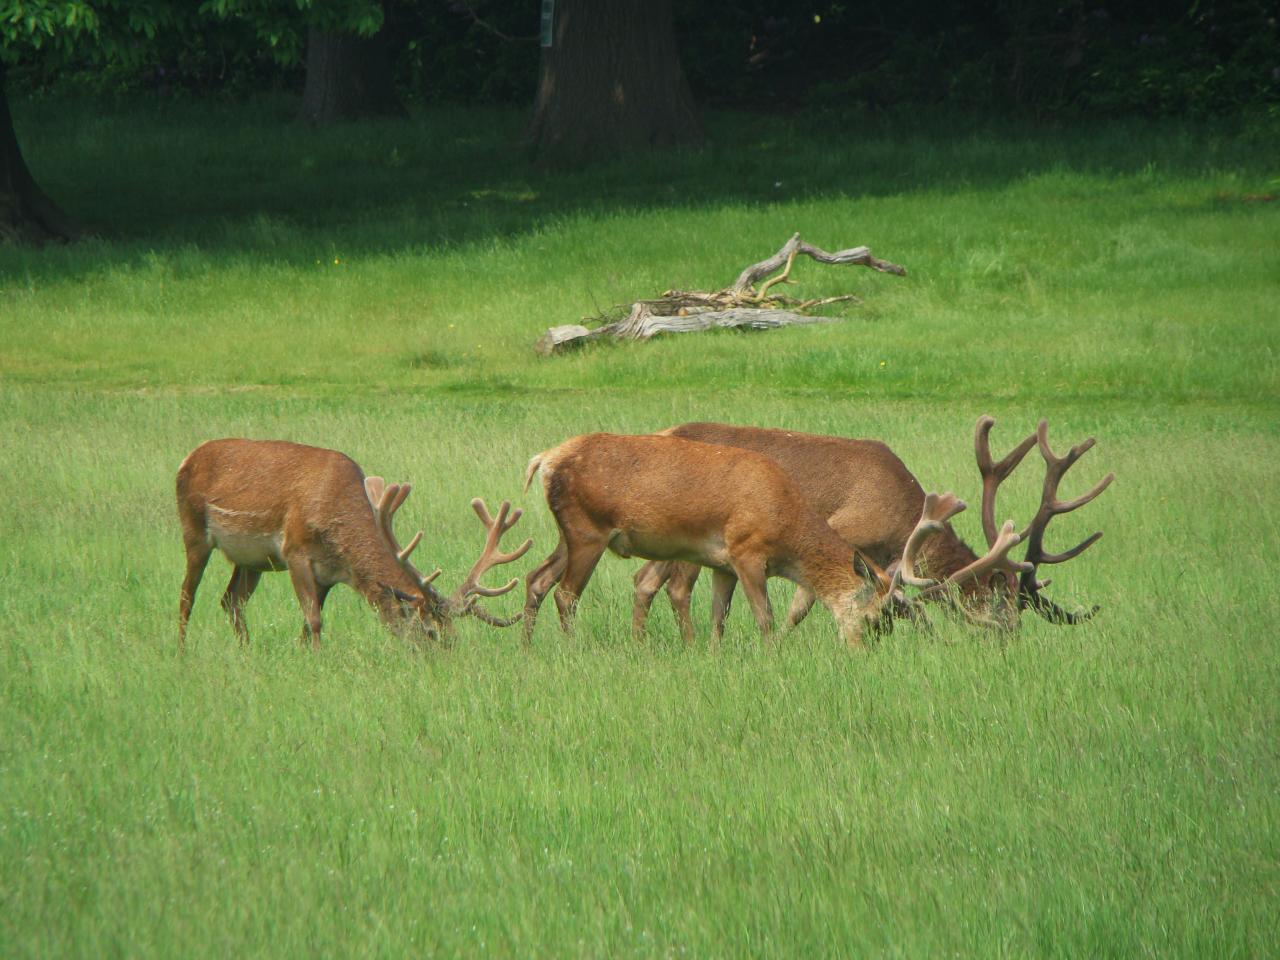 Three red deer stags